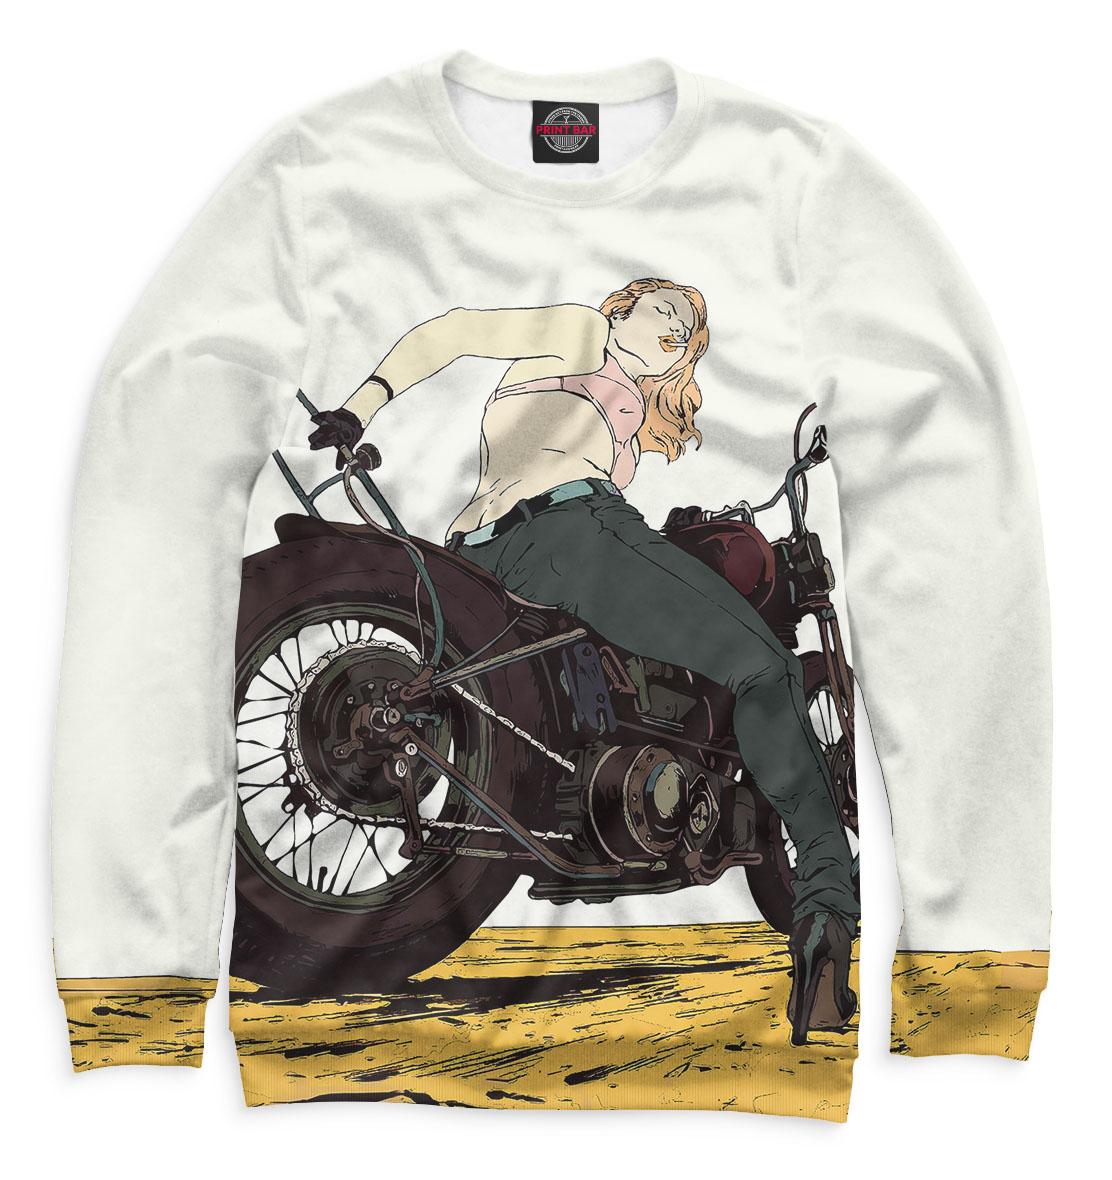 Купить Девушка на мотоцикле, Printbar, Свитшоты, MTR-939852-swi-1